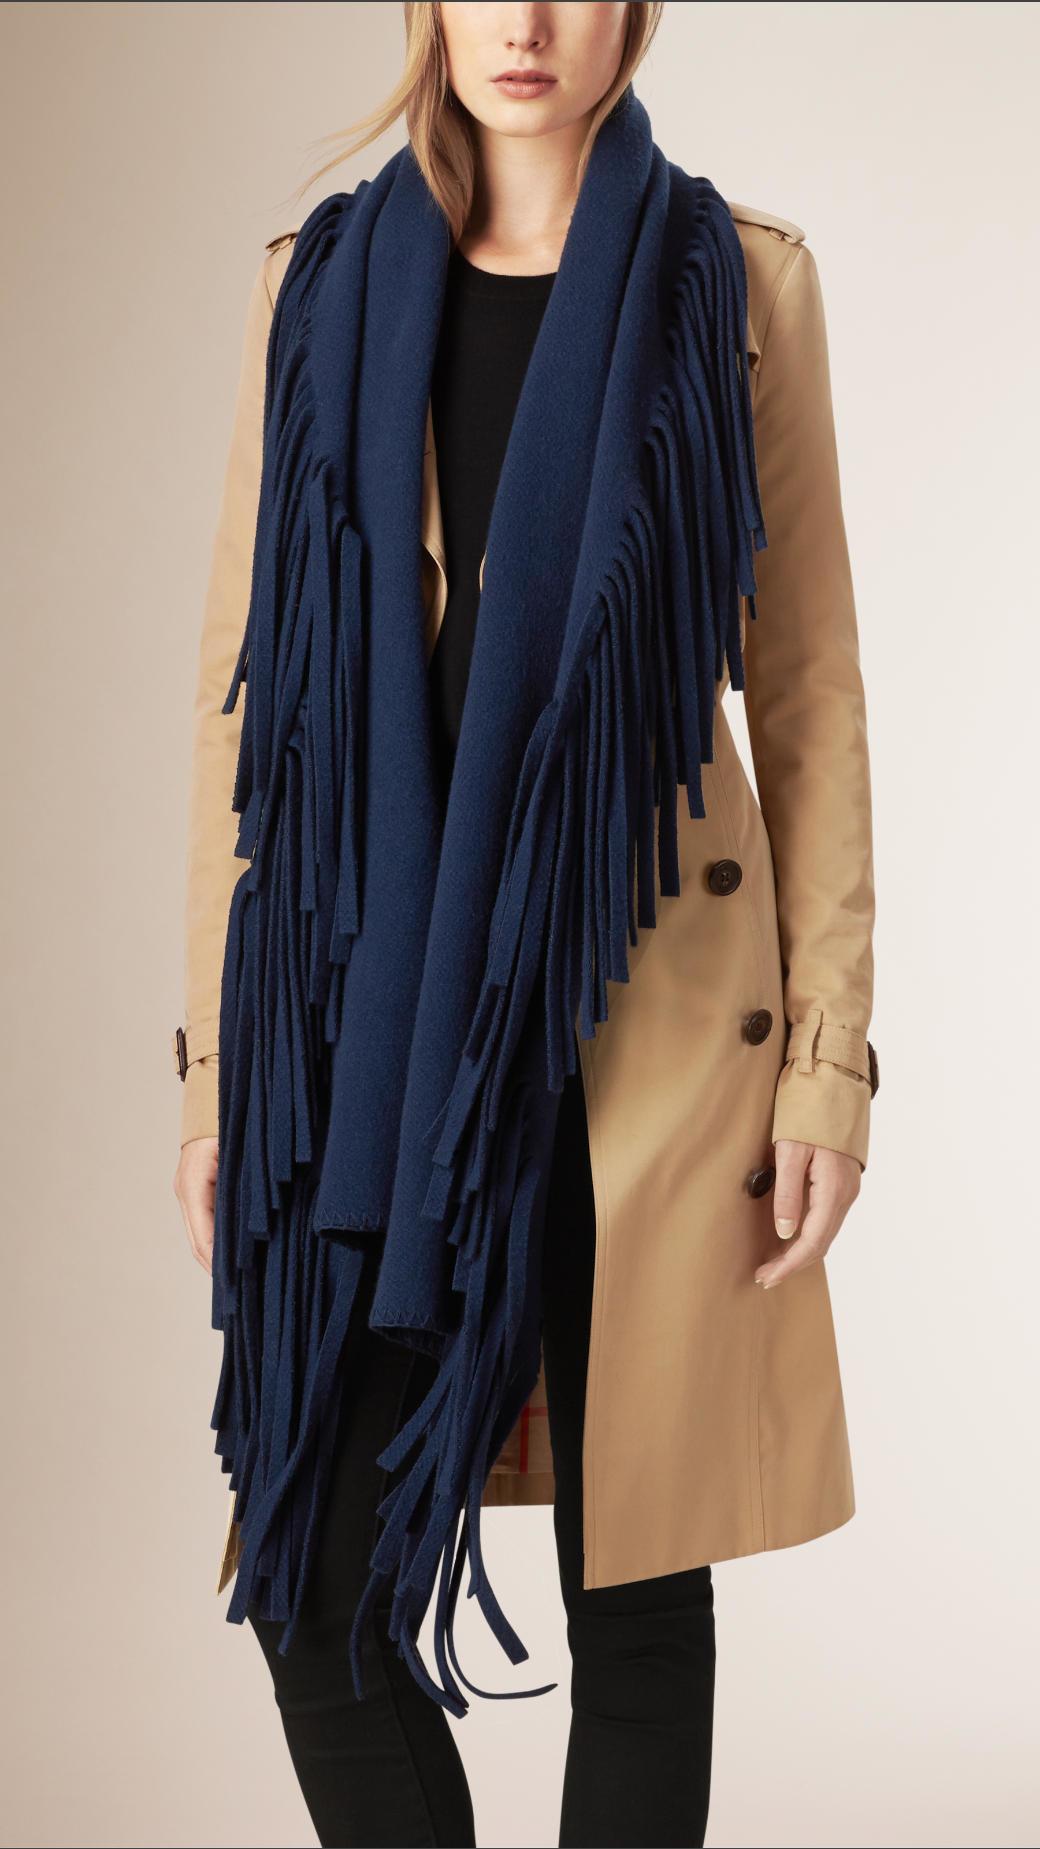 selezione migliore b0c8e 8d698 promo code for burberry wool and cashmere scarf 2d9b3 d777e